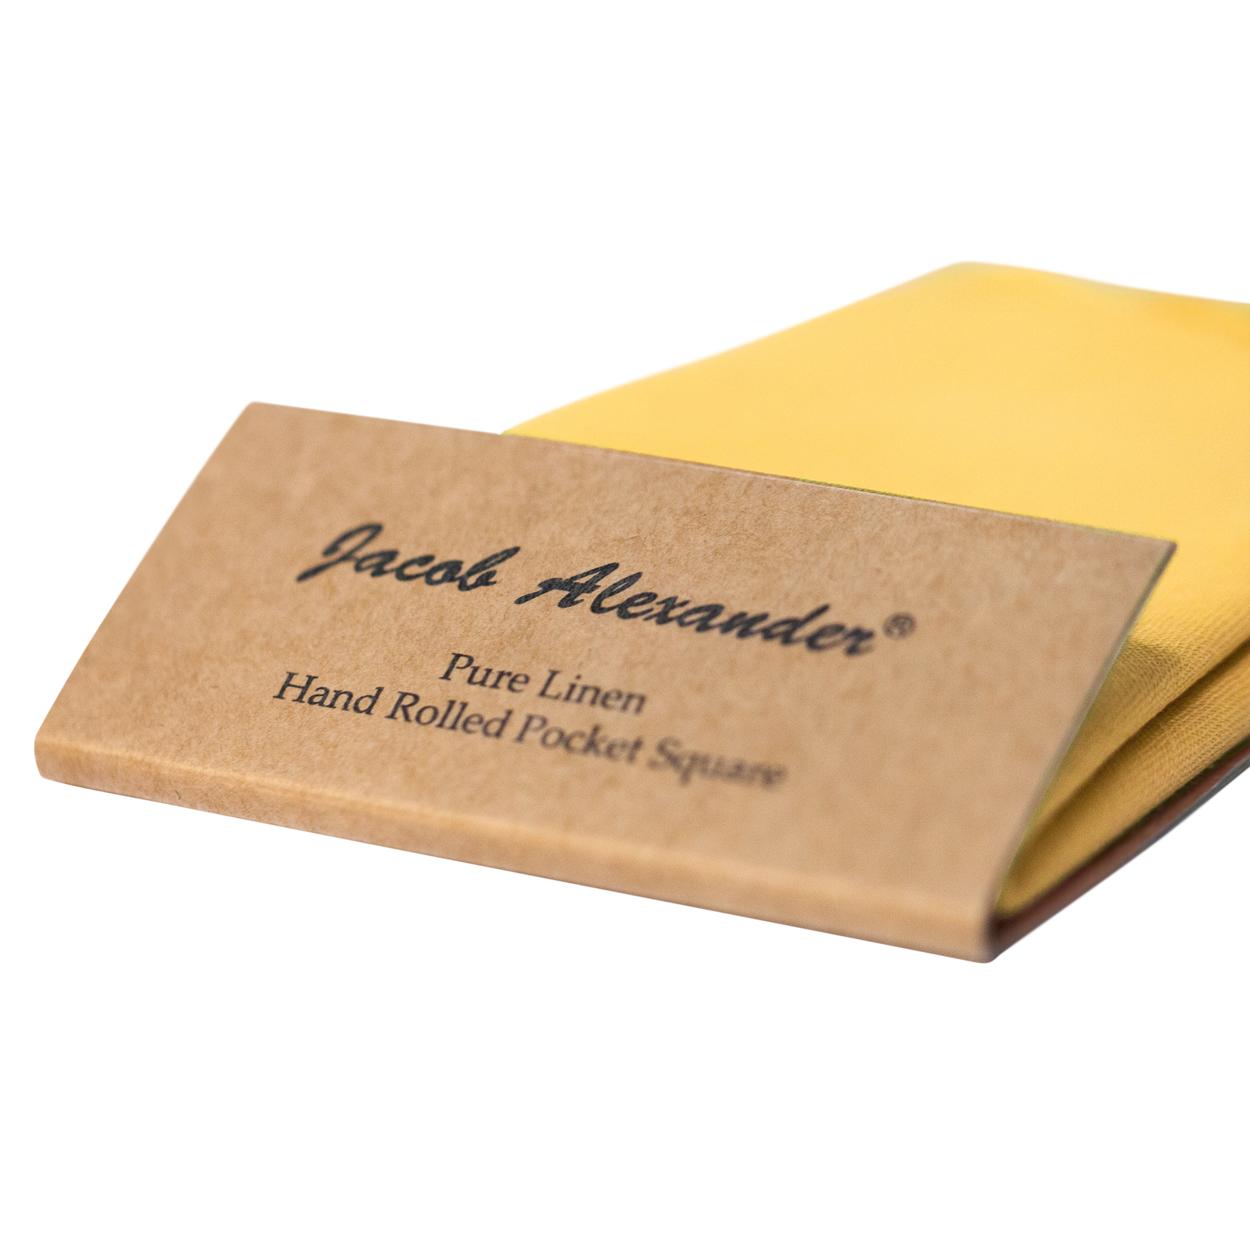 Jacob-Alexander-Linen-Handrolled-15-034-x-15-034-Pocket-Square-Hanky thumbnail 12